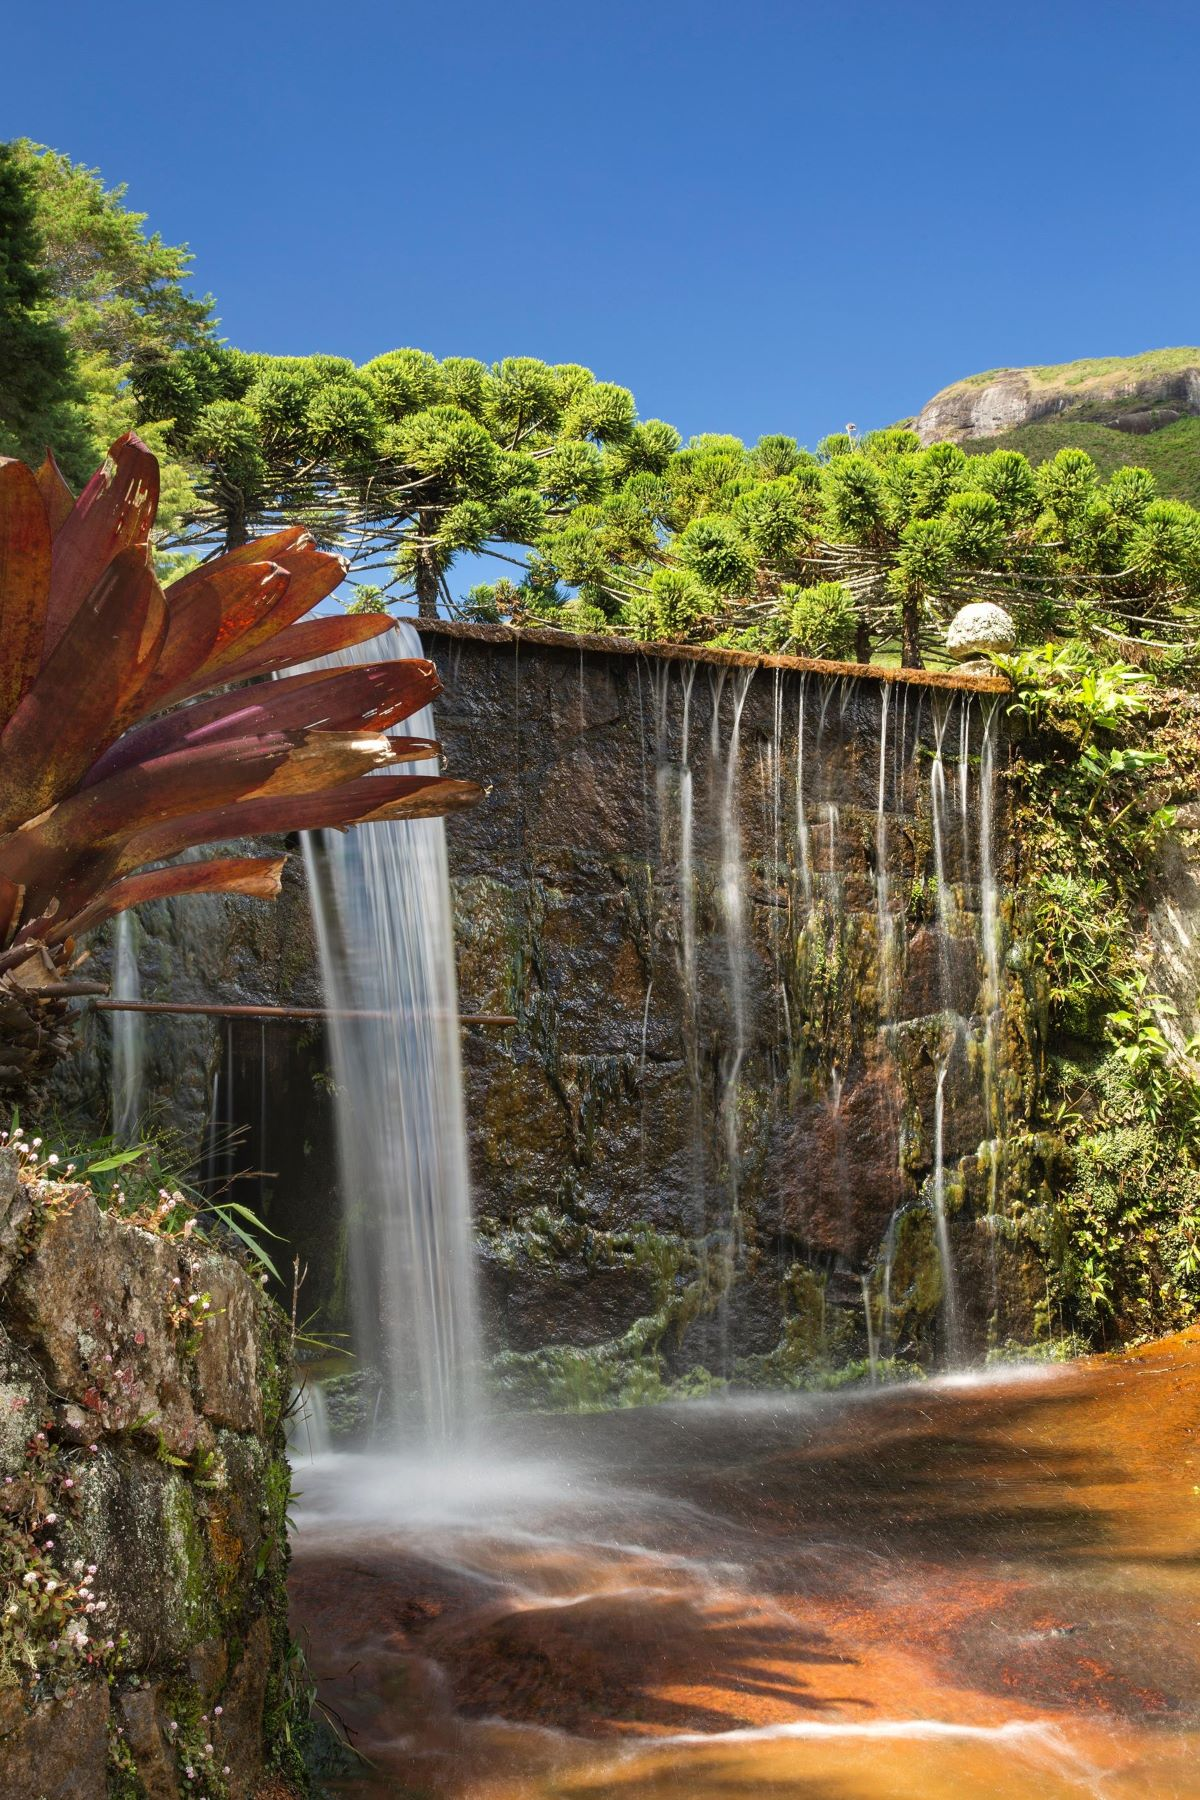 Tek Ailelik Ev için Satış at Charm and coziness at an gorgeous locati Rodovia Teresópolis-Itaipava Teresopolis, Rio De Janairo, 25966-200 Brezilya